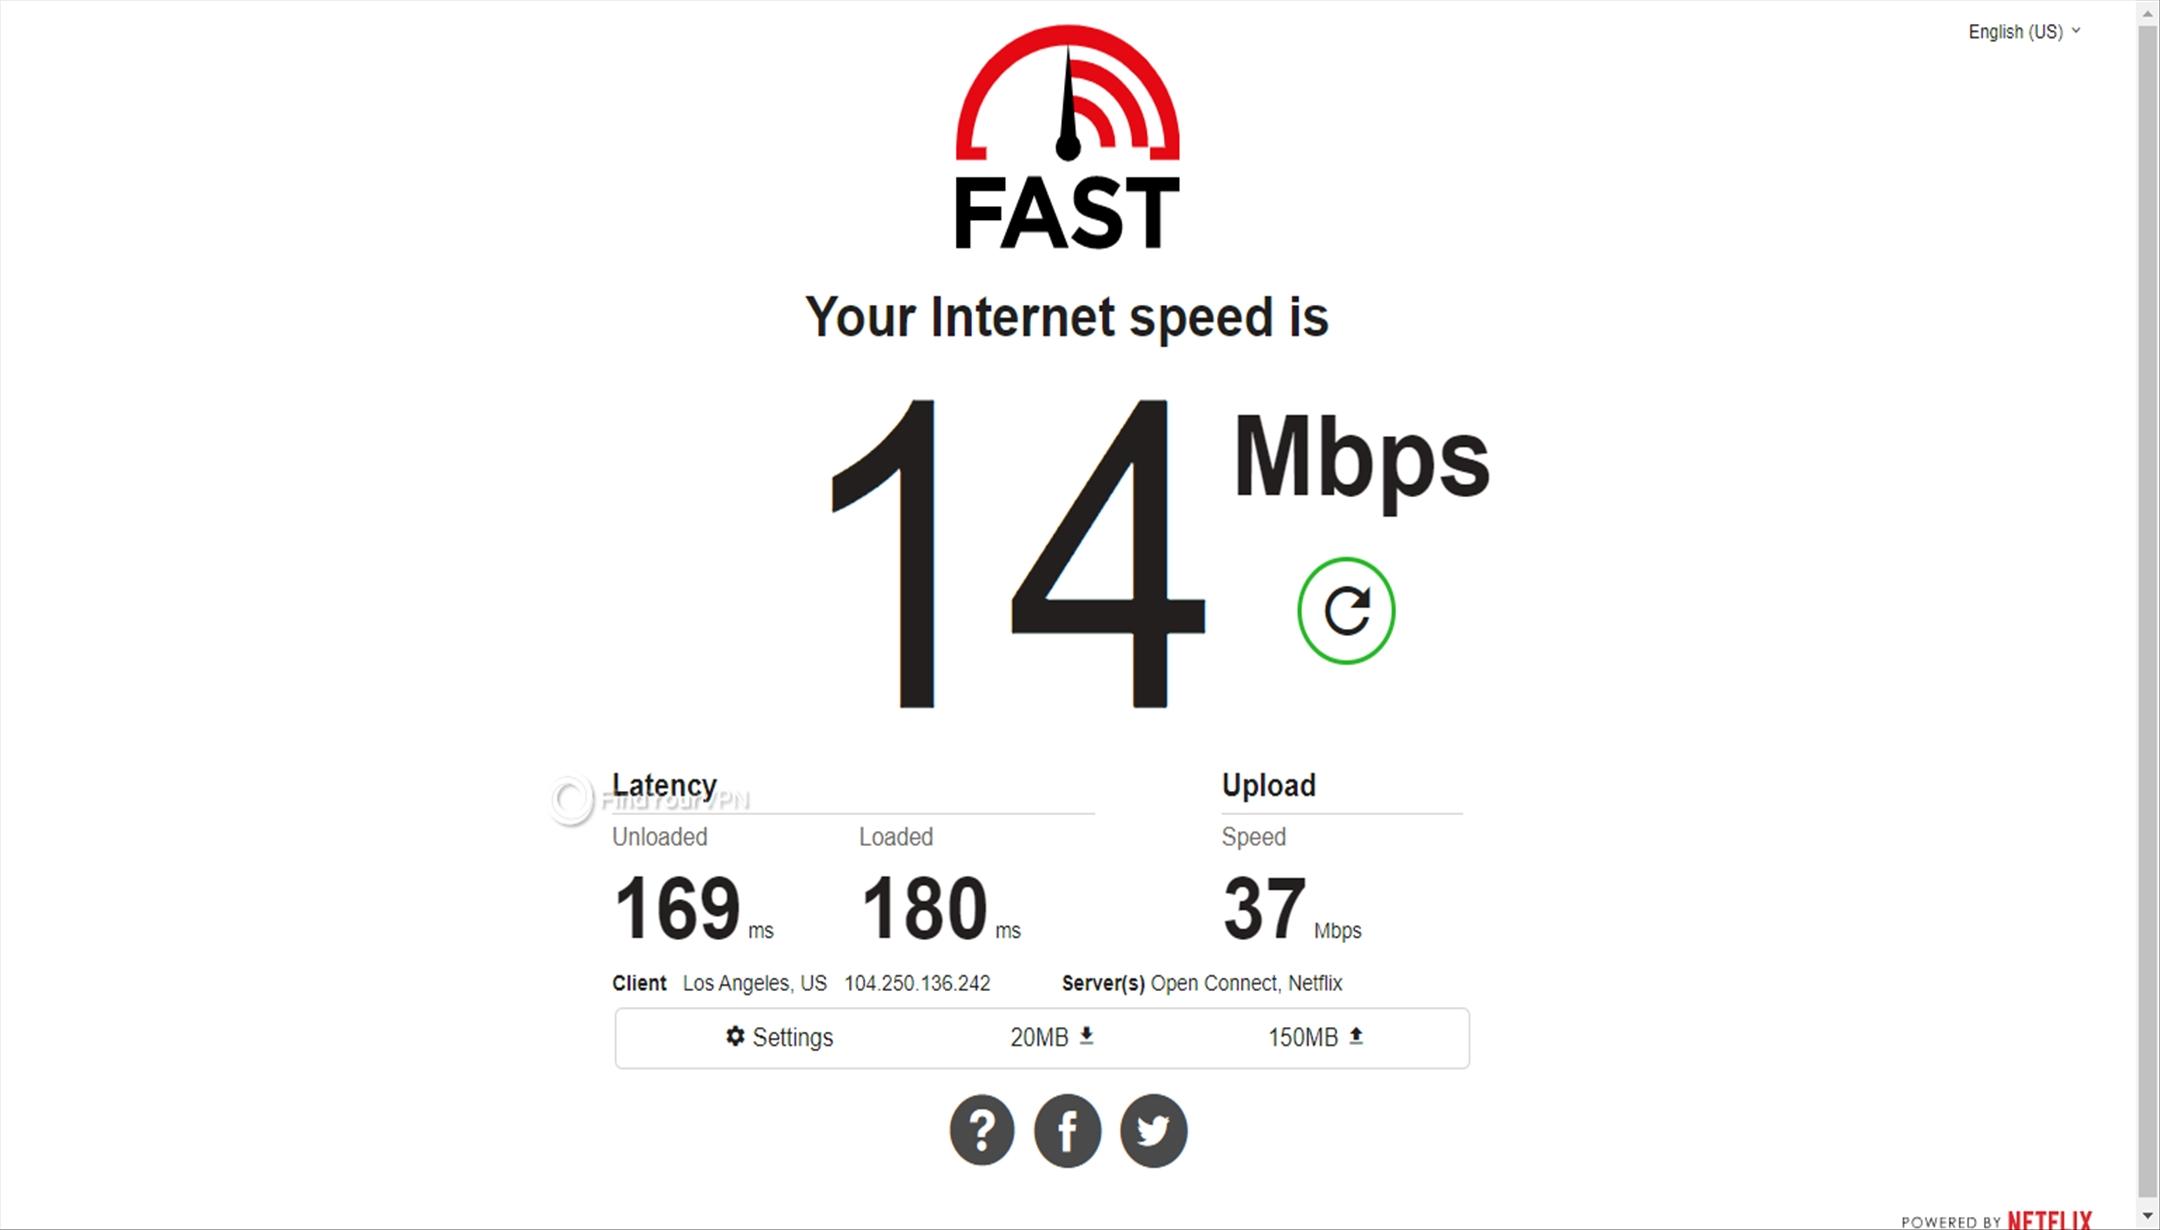 BolehVPN's USA speed test